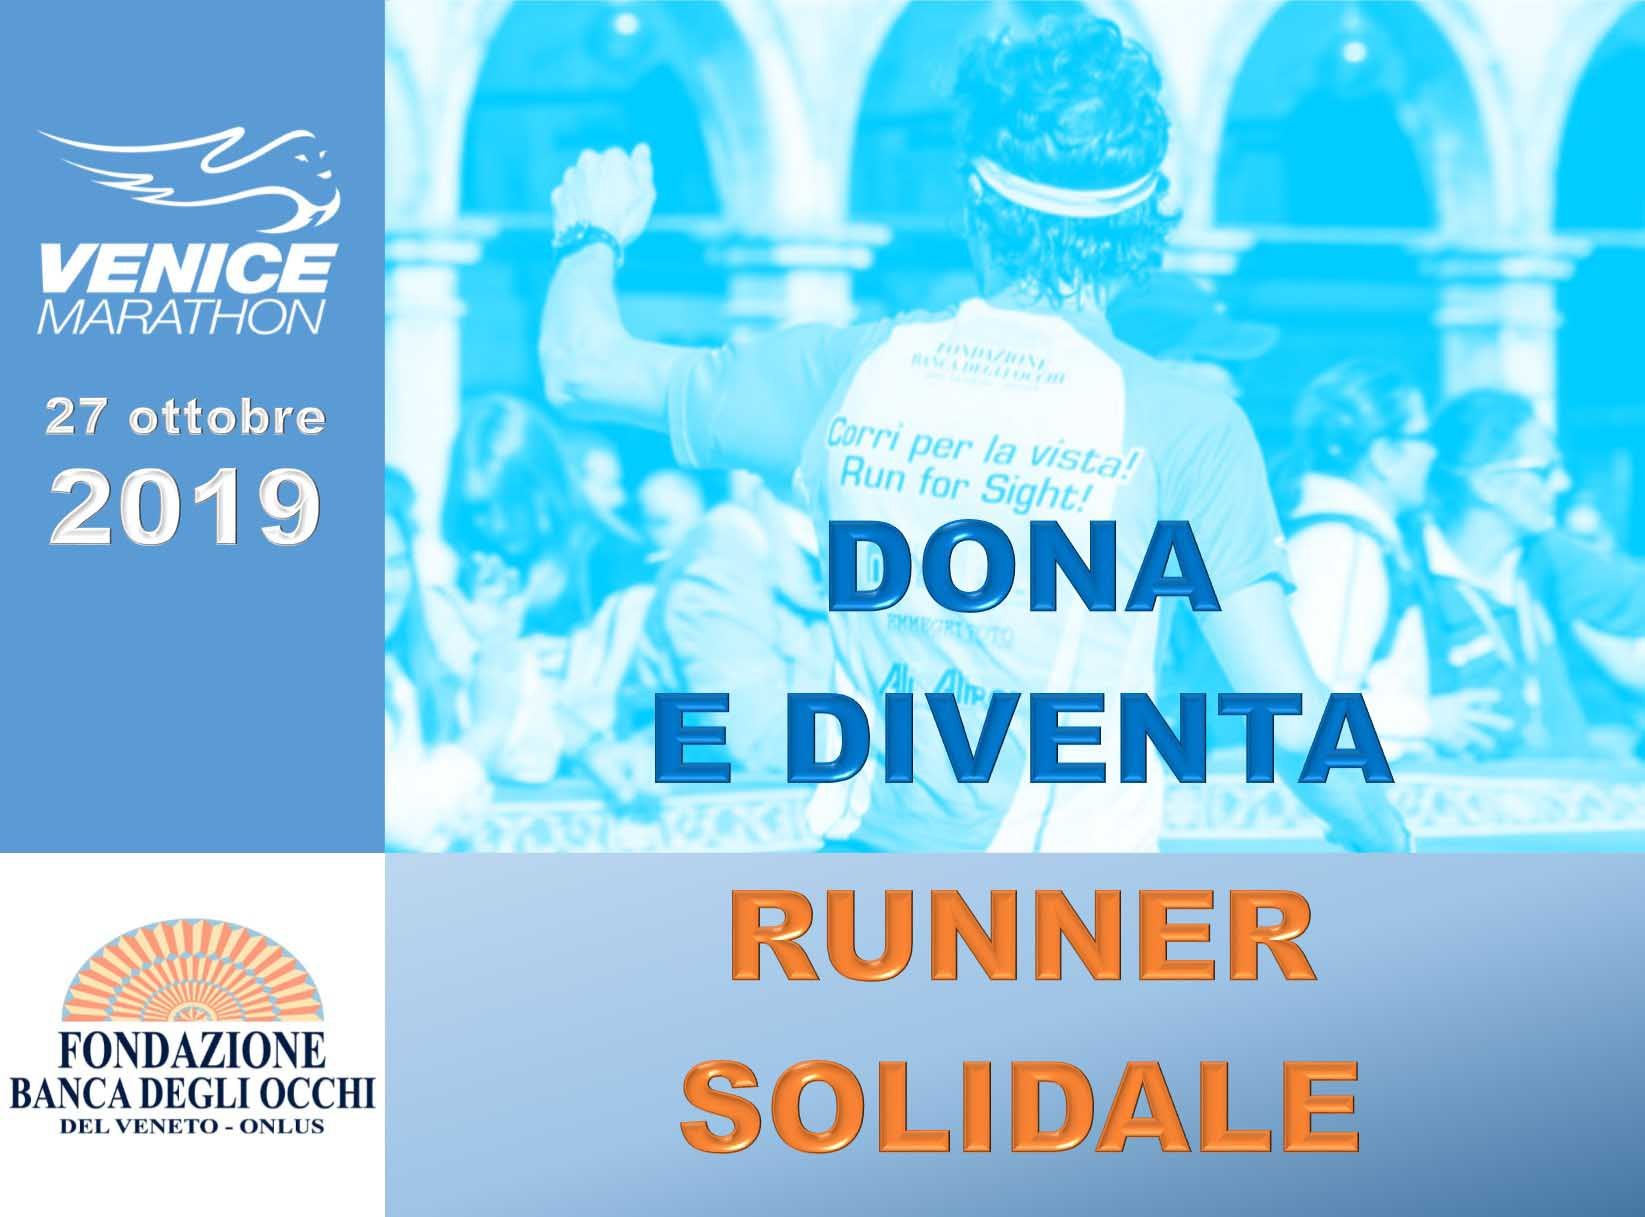 Venicemarathon 2019: diventa runner solidale